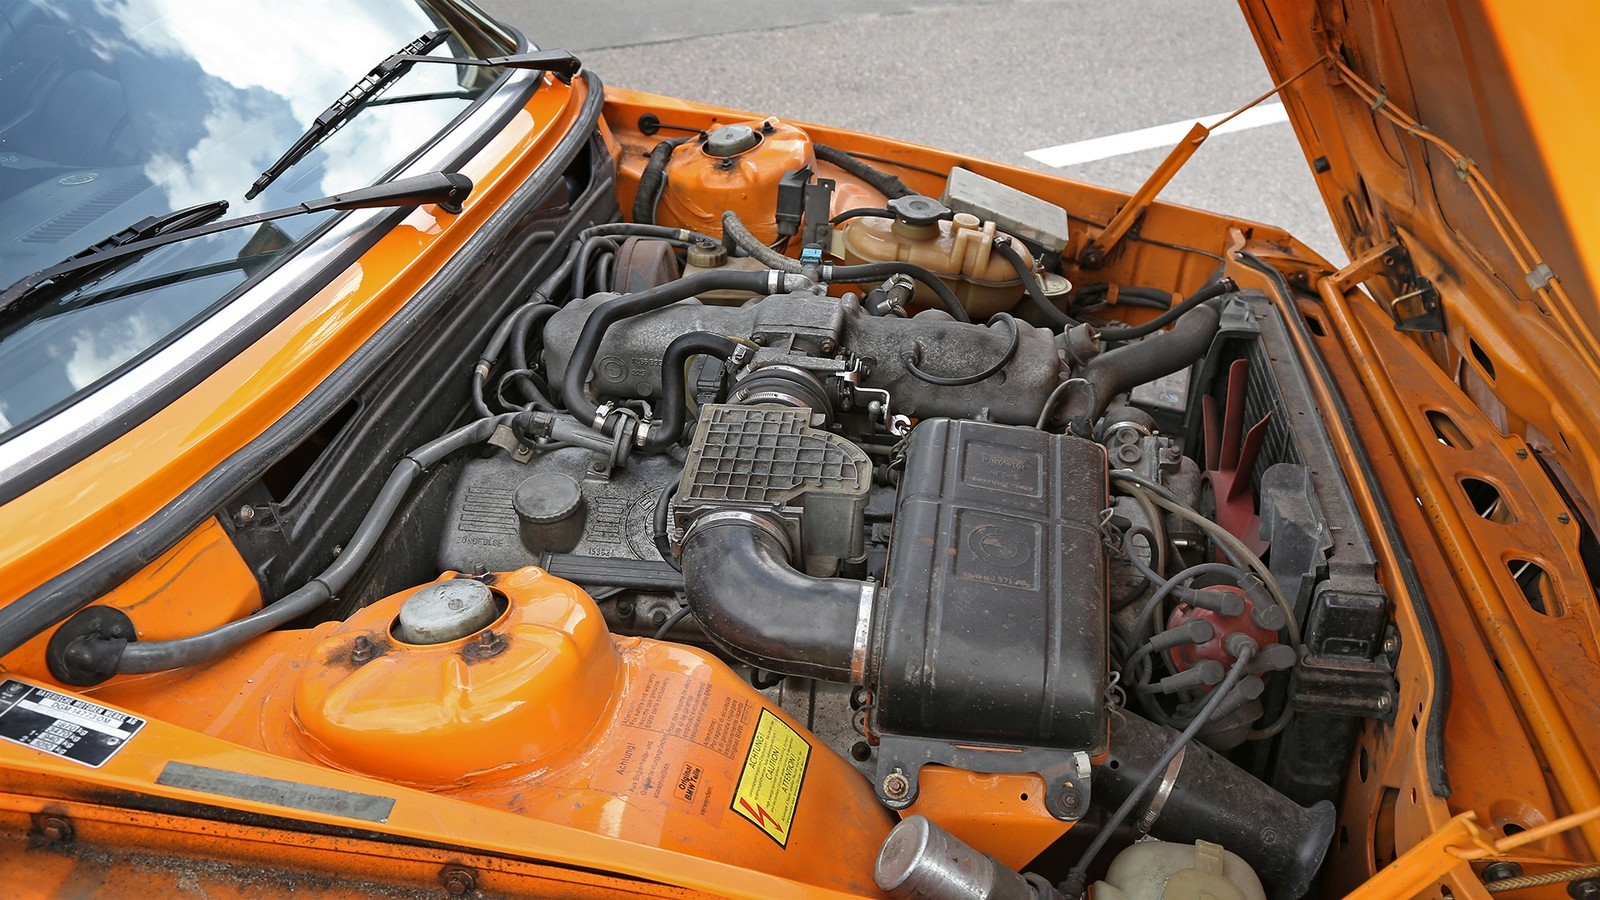 KC2A6817